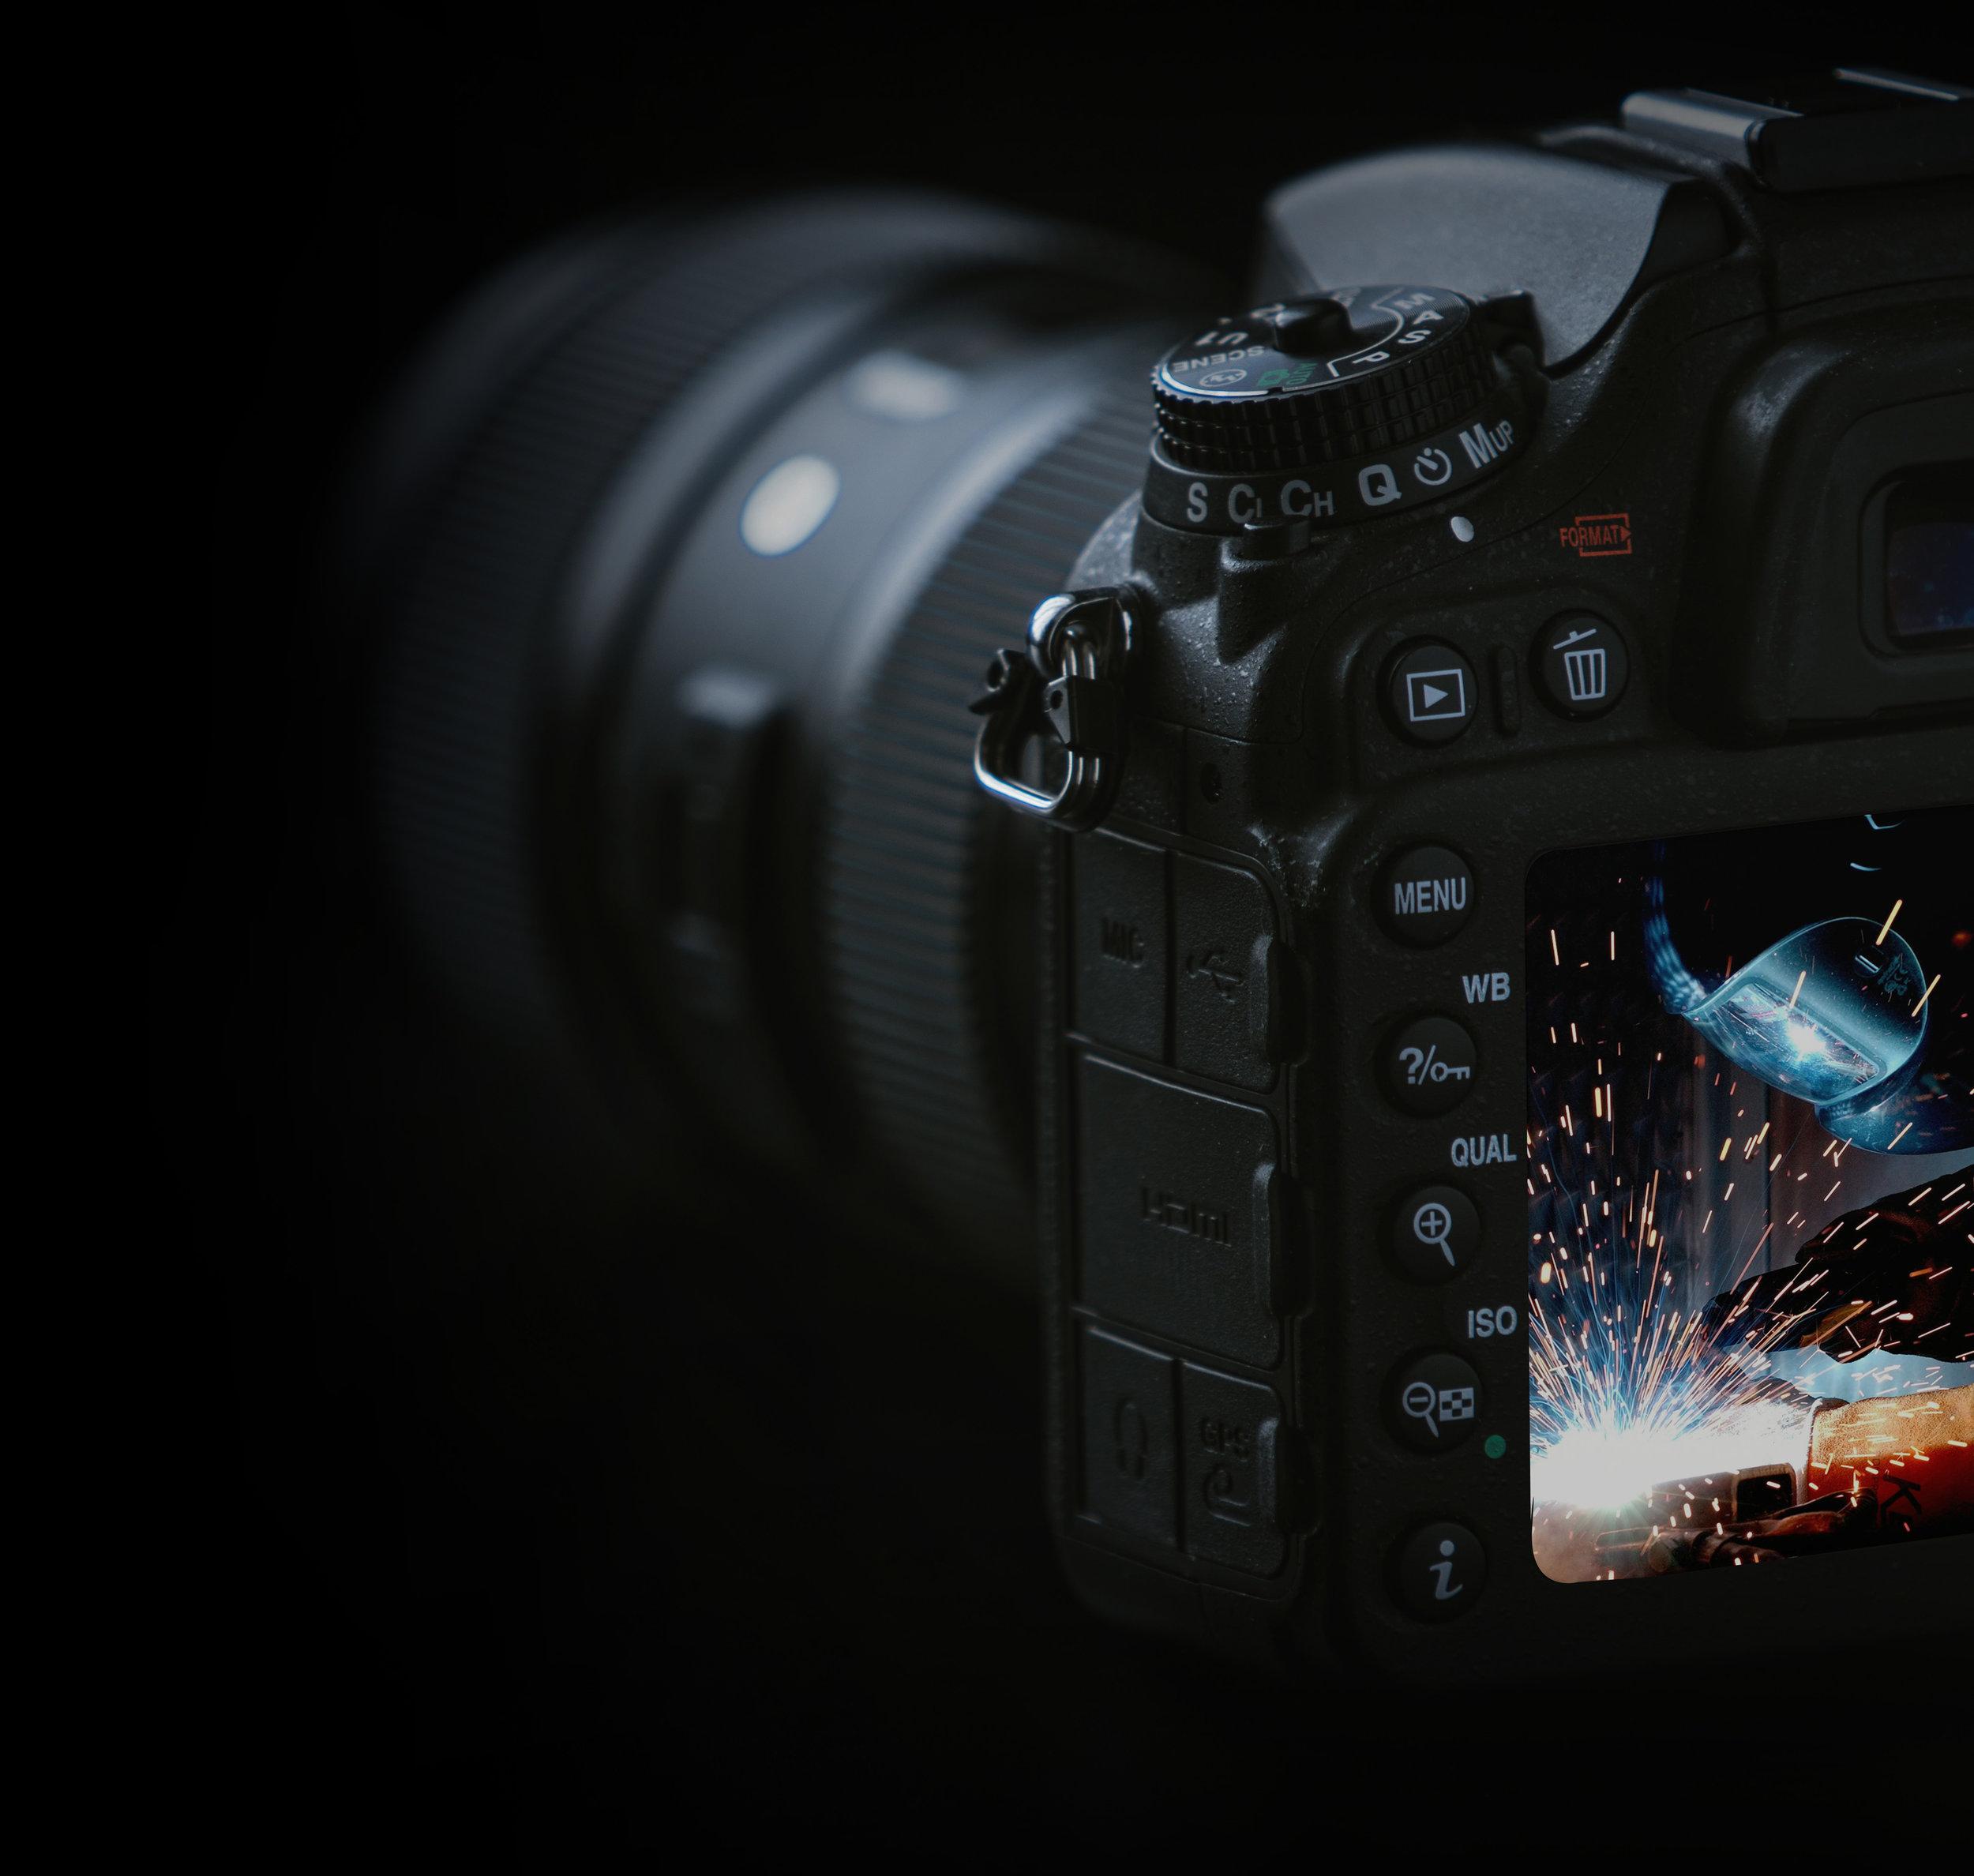 cameracomm.jpg